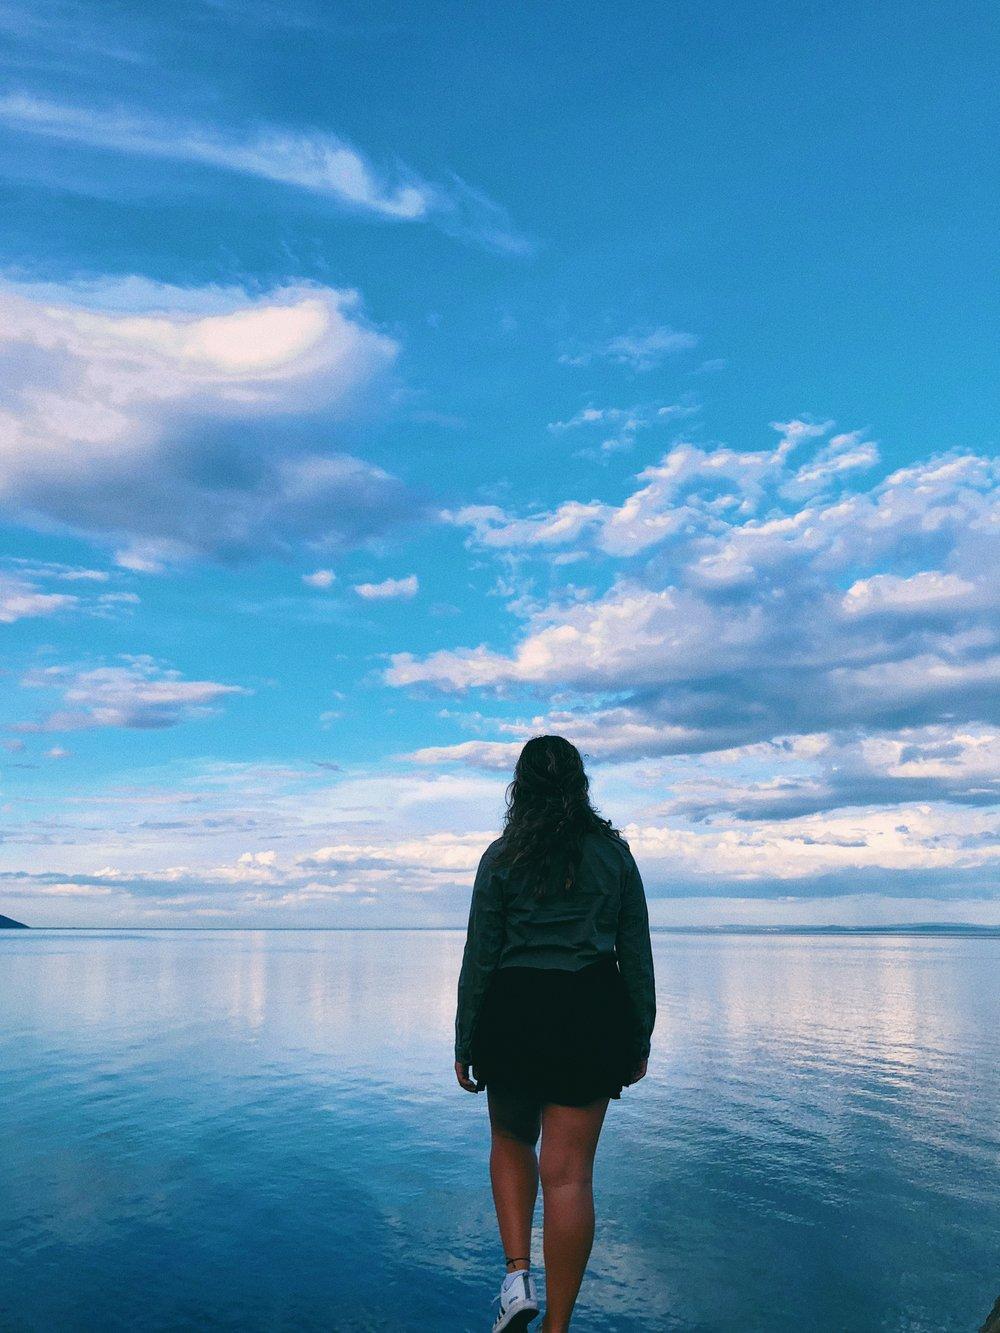 lamalbaie_quebec_travelbloggera-digitalnomad_ambarjanuel